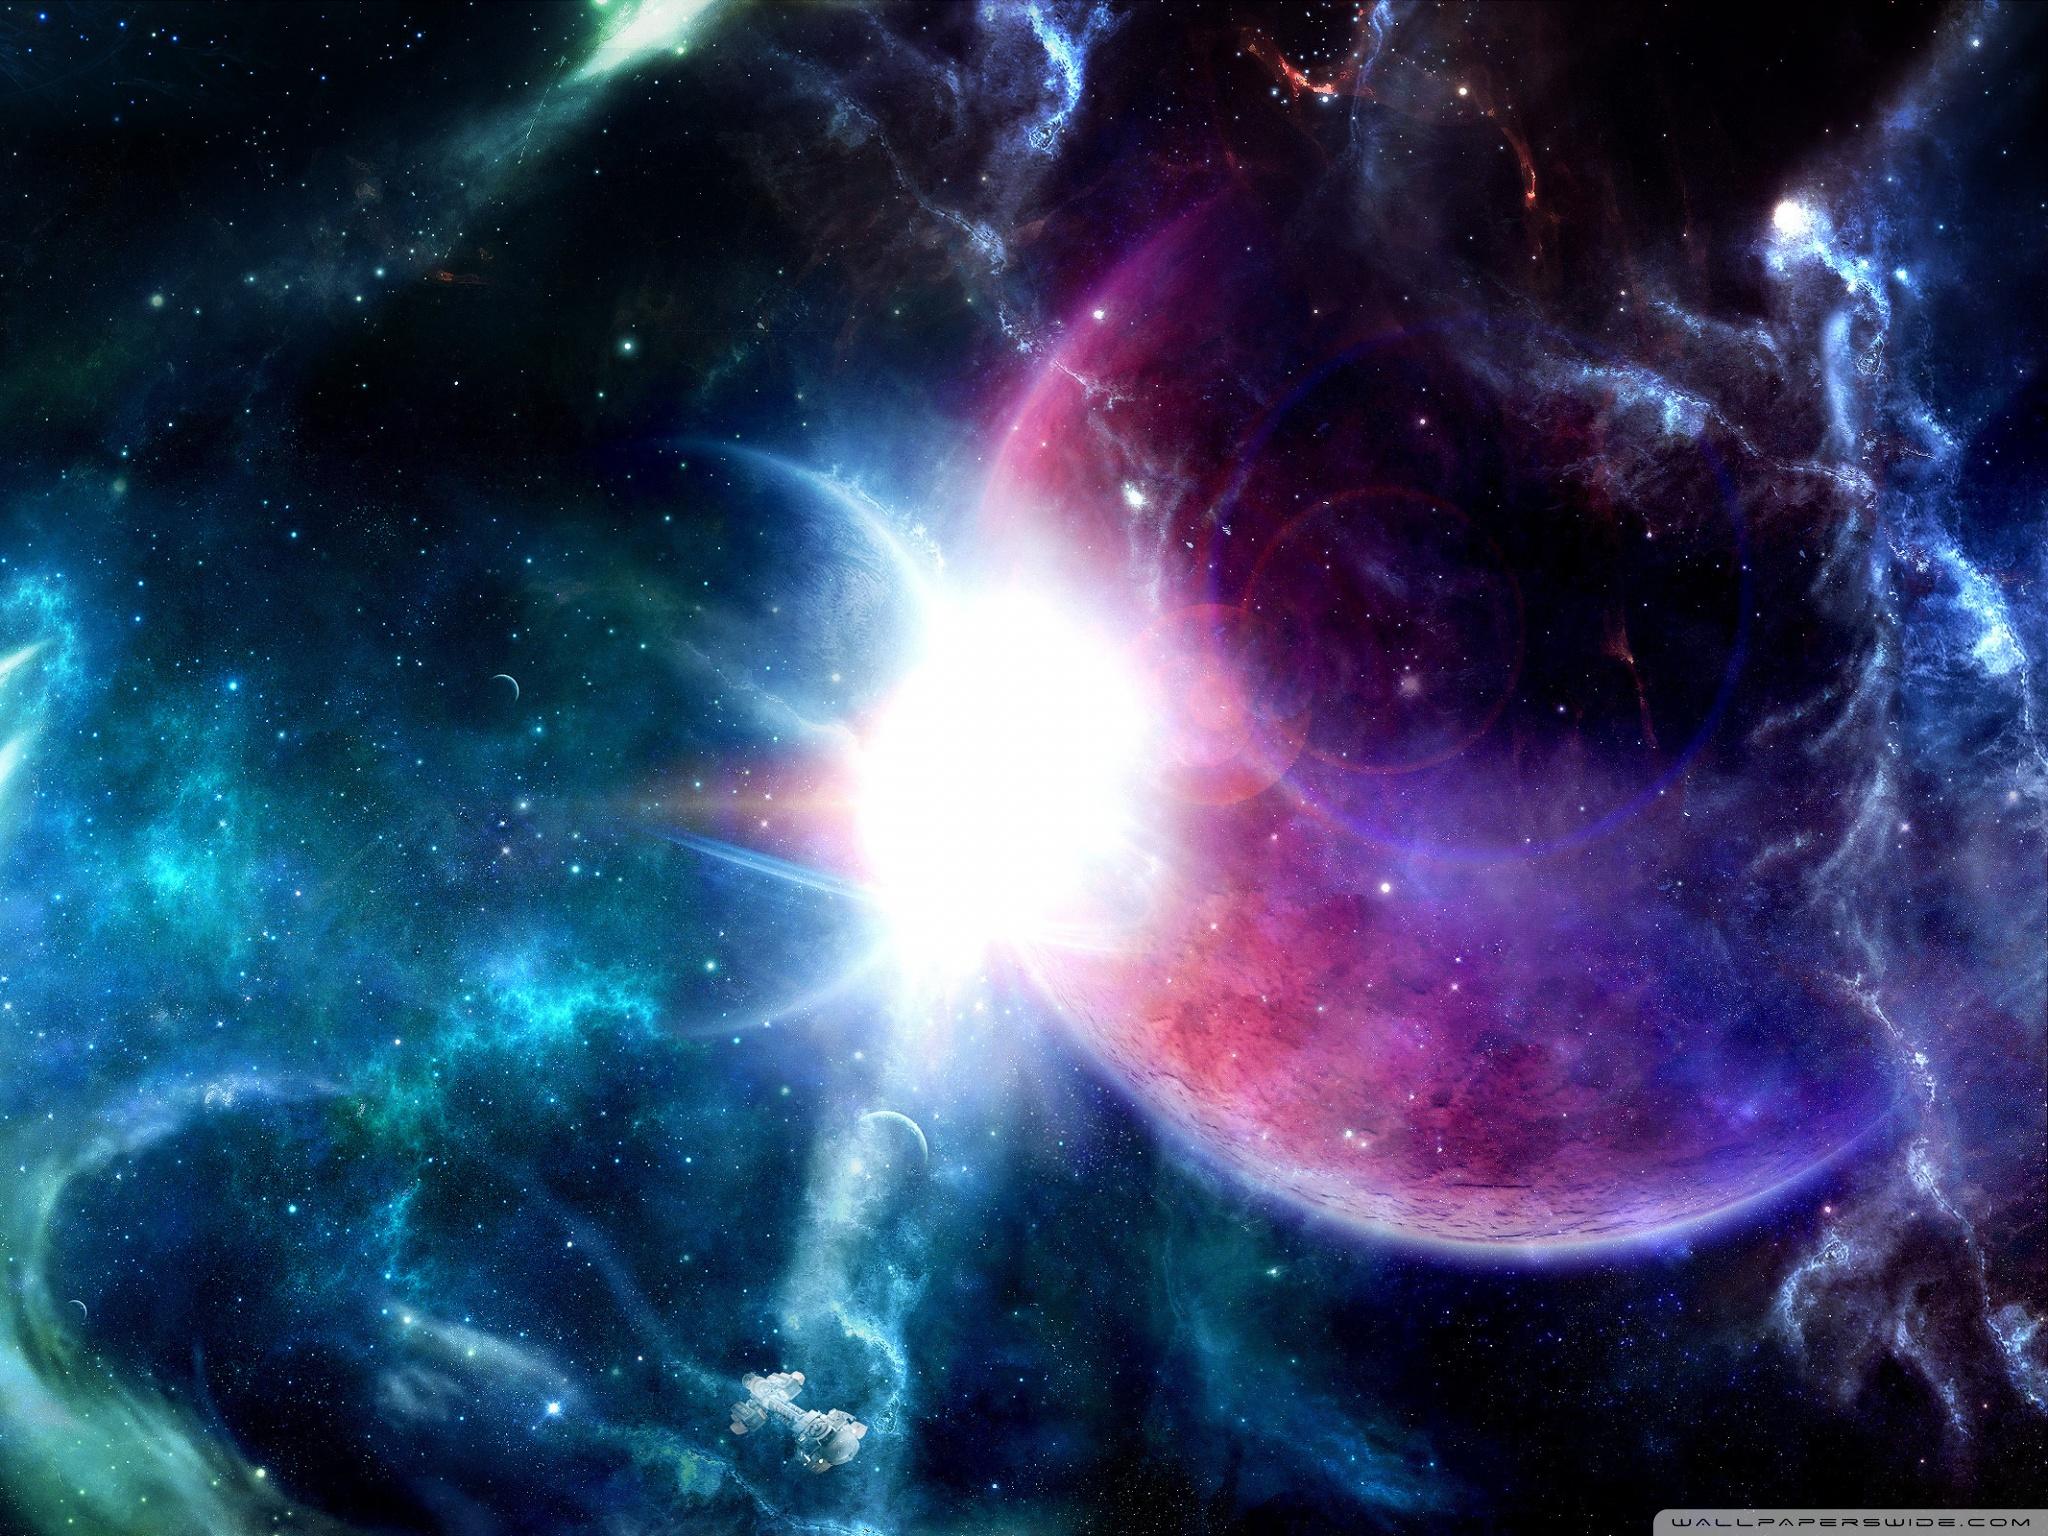 Space Fantasy 4K HD Desktop Wallpaper For Ultra TV O Tablet